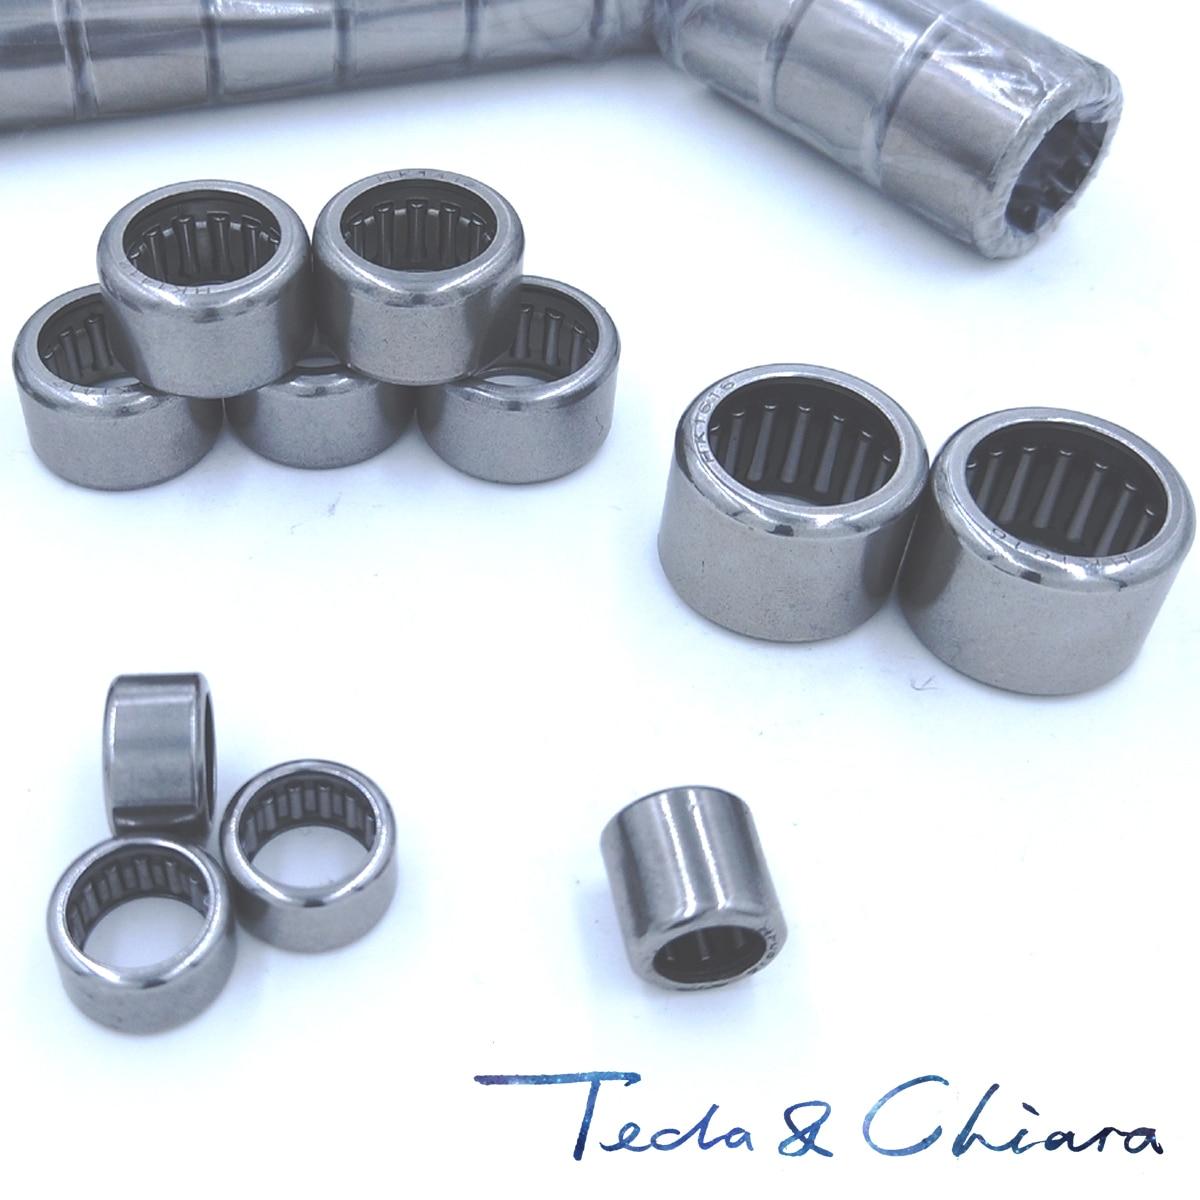 HK222820 Needle Roller Bearing Bearings 22*28*20 HK2220 10 PCS 22x28x20 mm